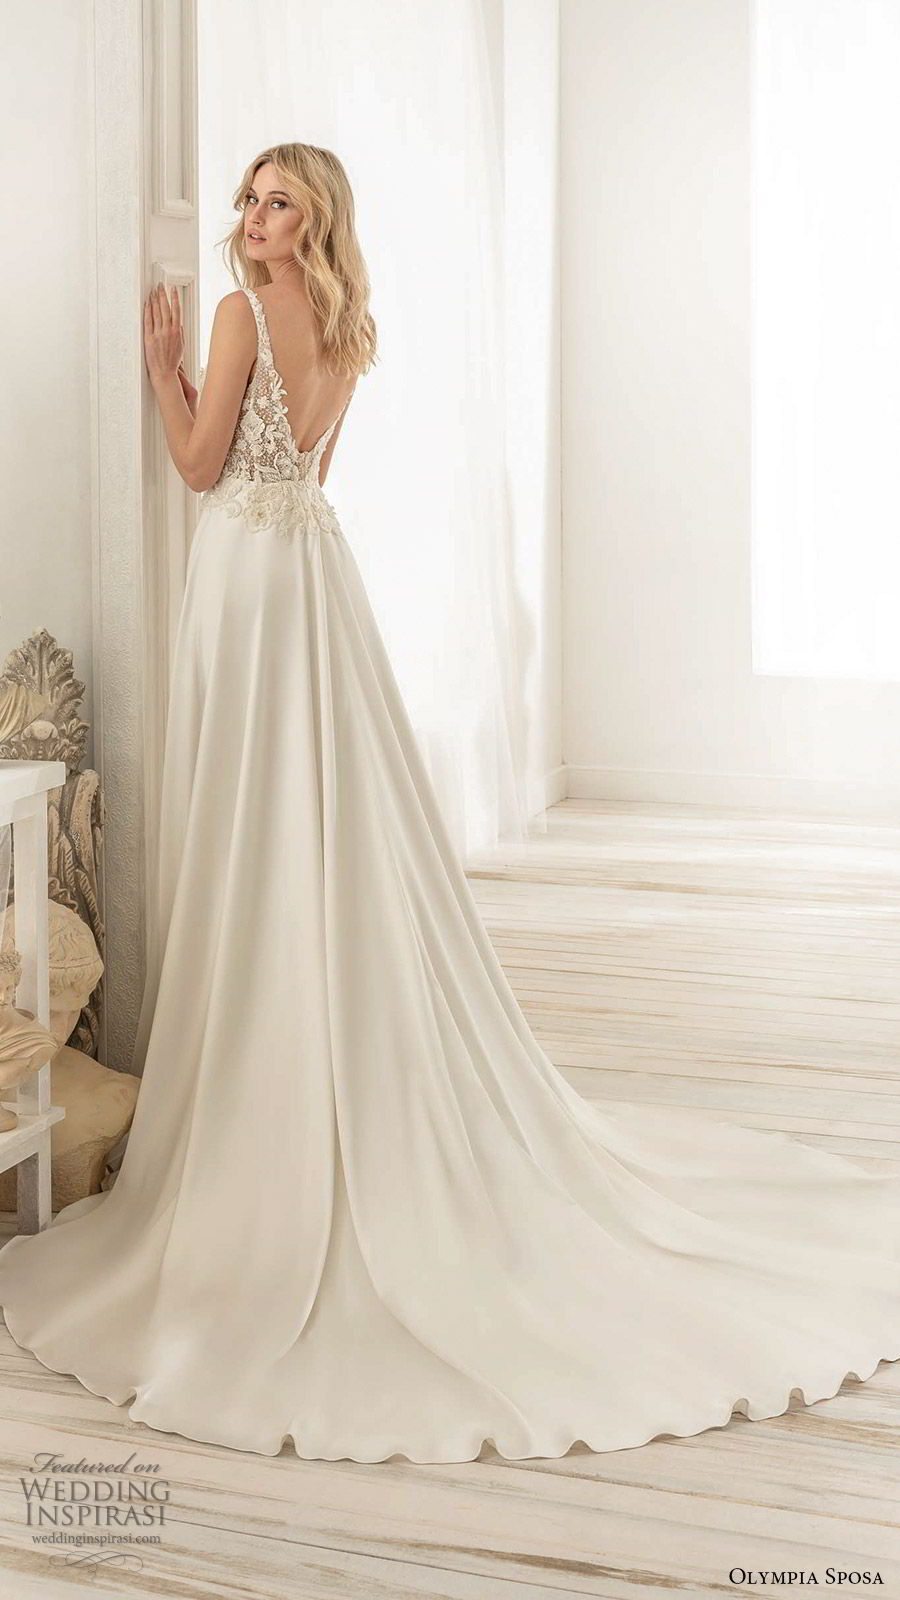 olympia sposa 2020 bridal sleeveless straps v neckline embellished bodice side cutouts a line ball gown wedding dress (4) elegant romantic scoop back chapel train bv